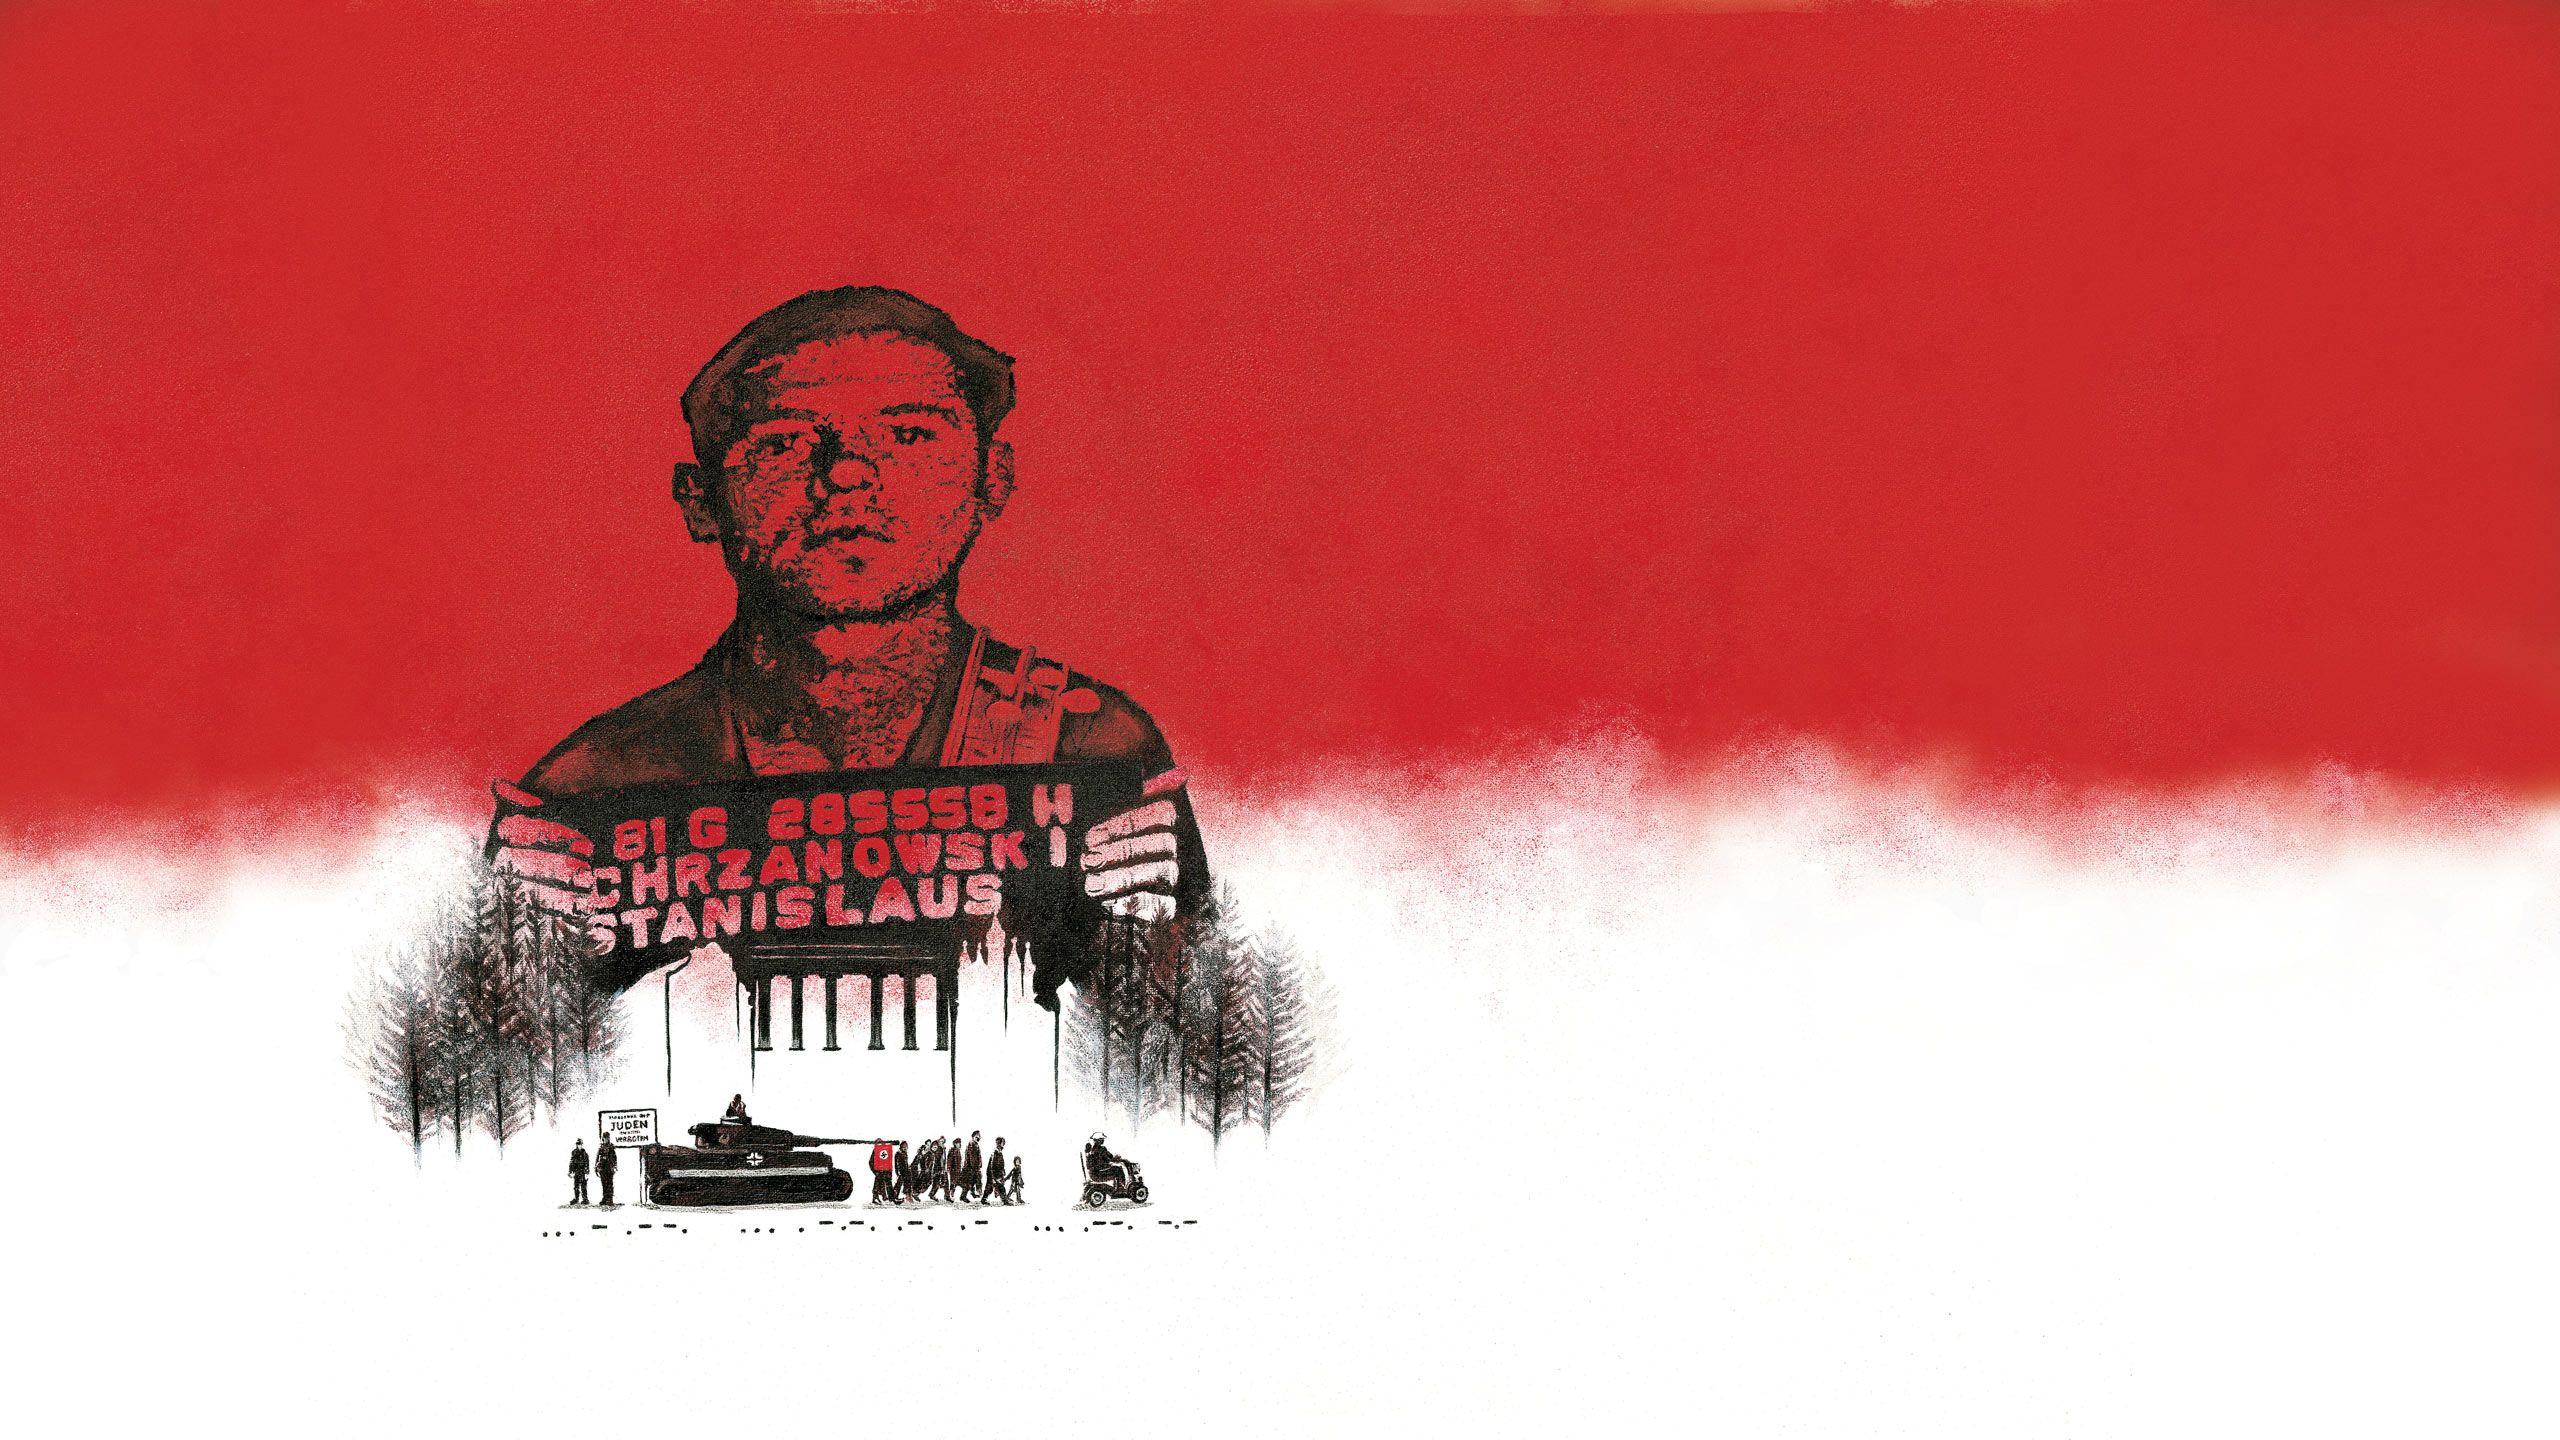 Artwork of Stanislaw 'Stan' Chrzanowksi